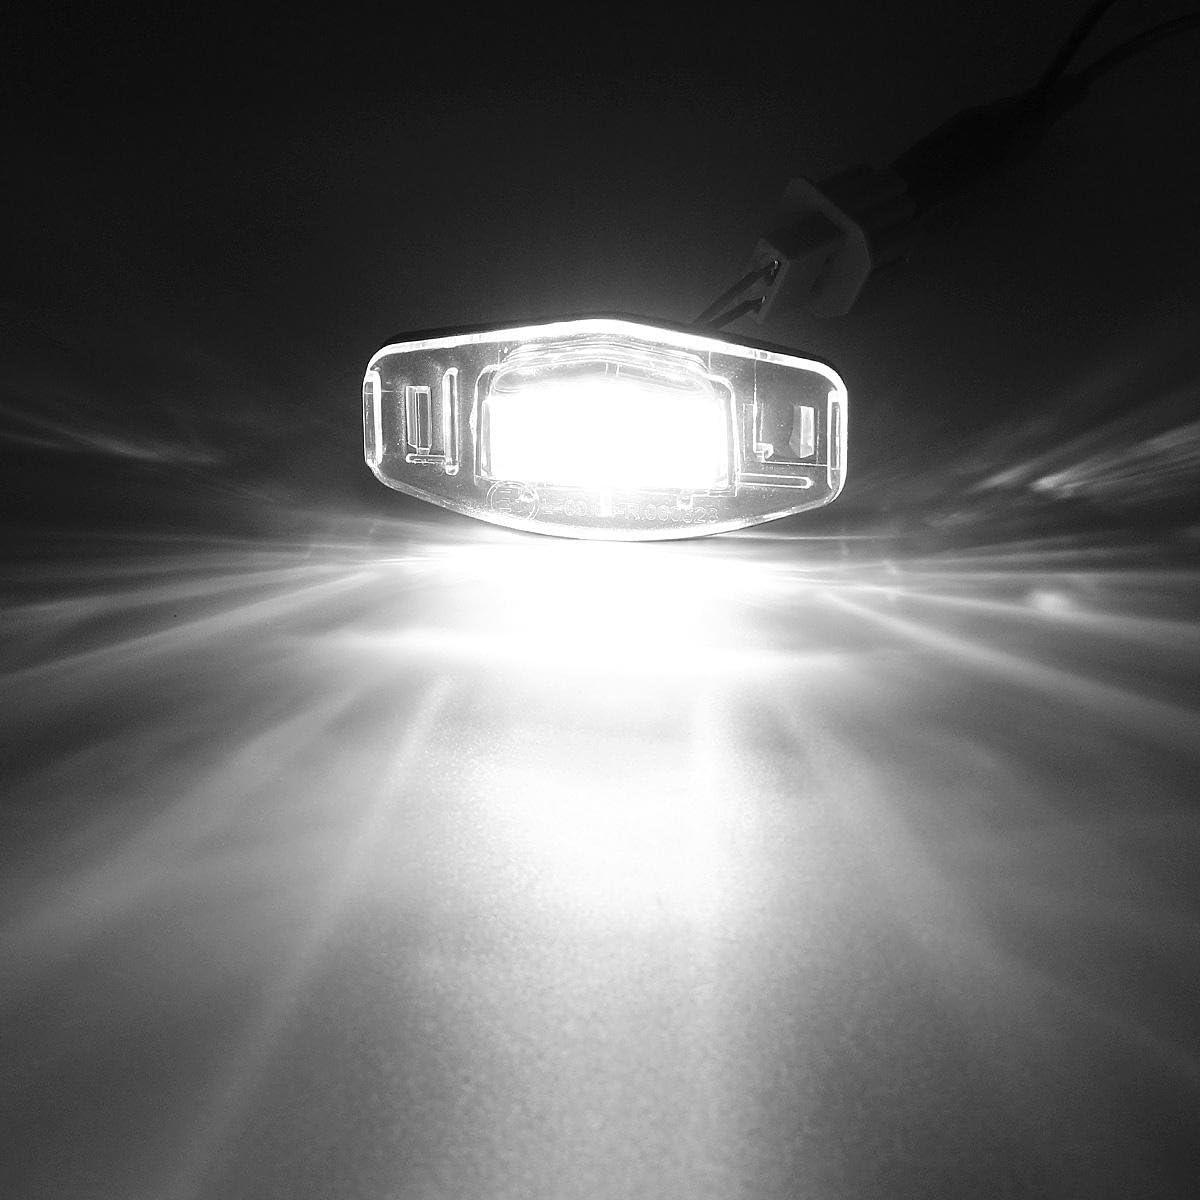 Número De Matrícula Luces-Blanco brillante LED SMD Honda Civic 10th GEN 2016